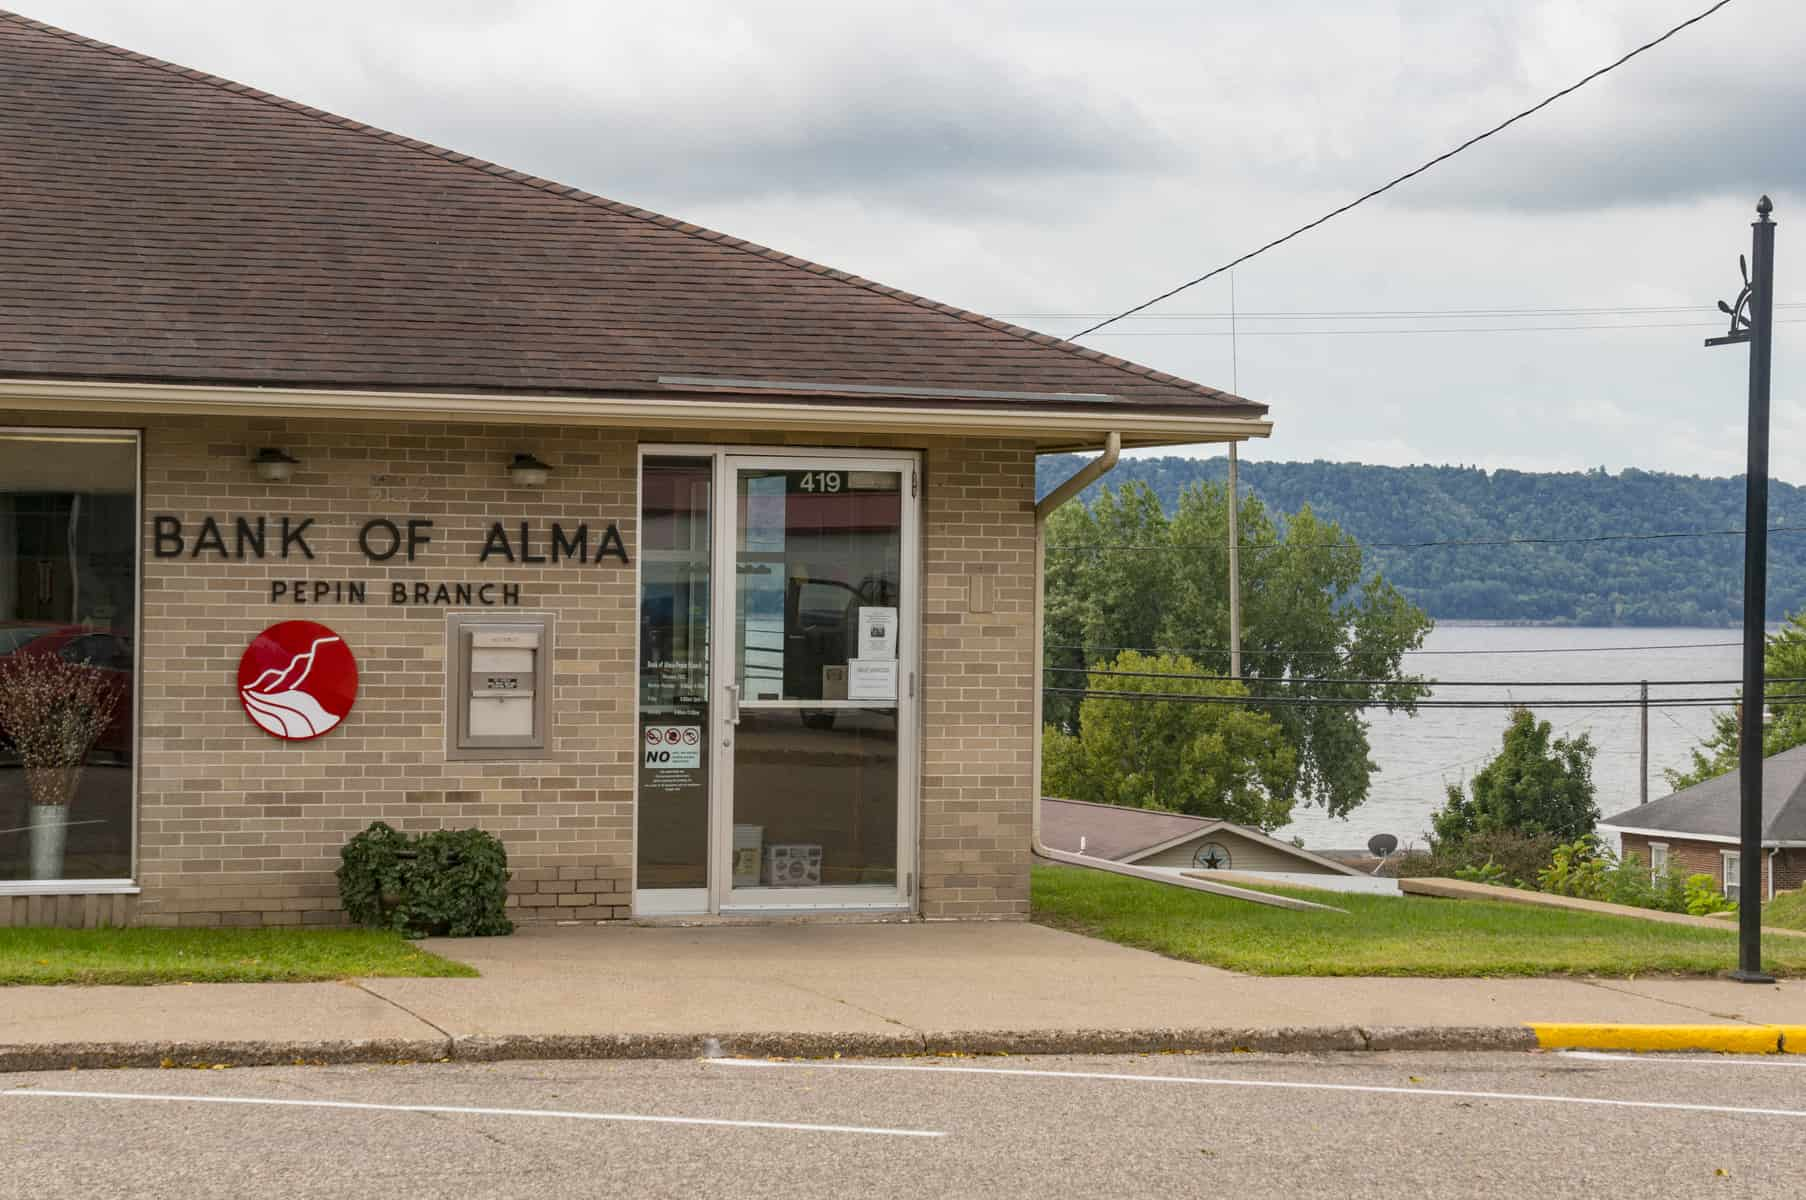 Bank of Alma